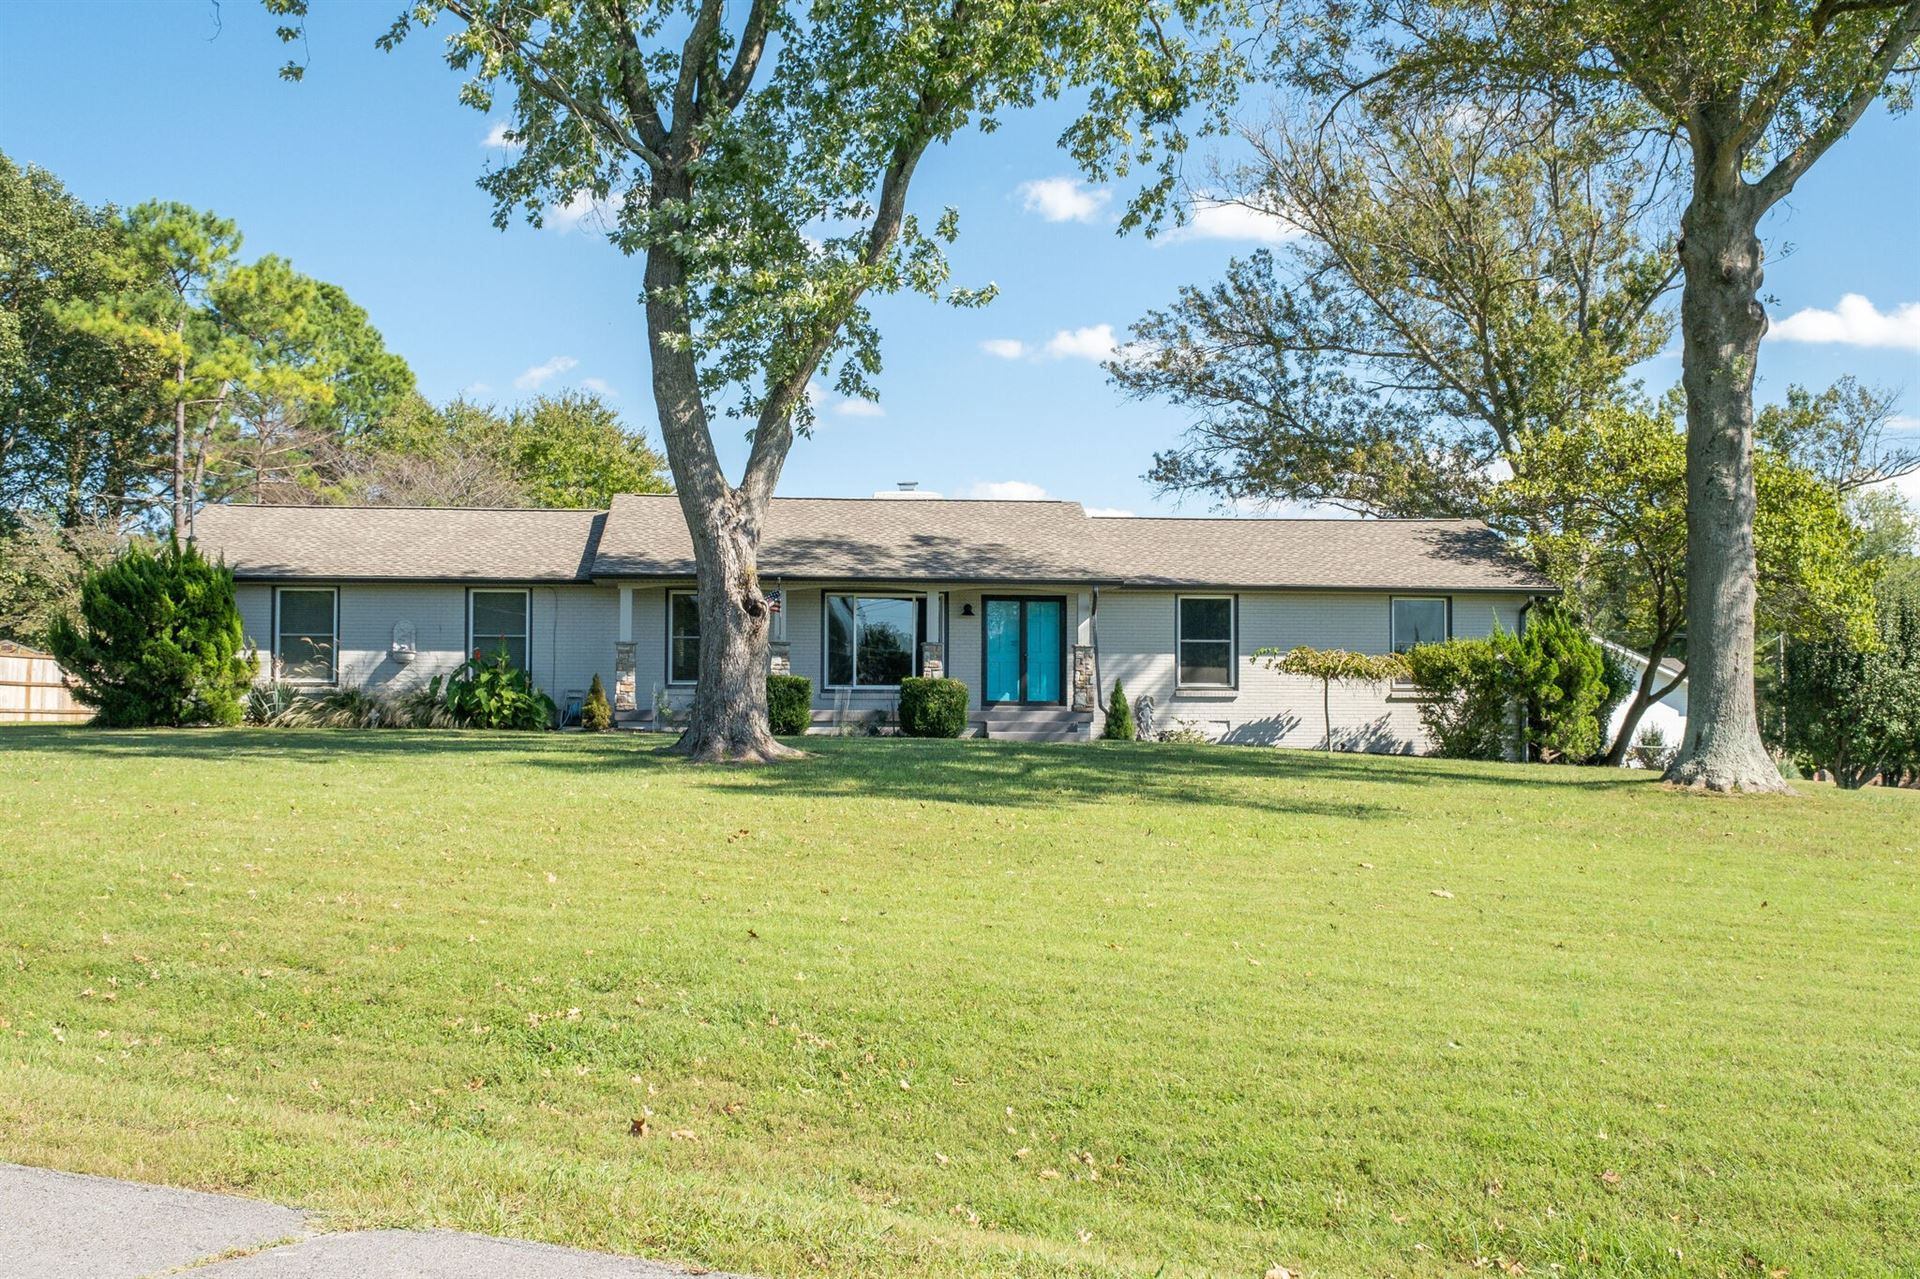 121 Lake Vista Dr, Hendersonville, TN 37075 - MLS#: 2298931